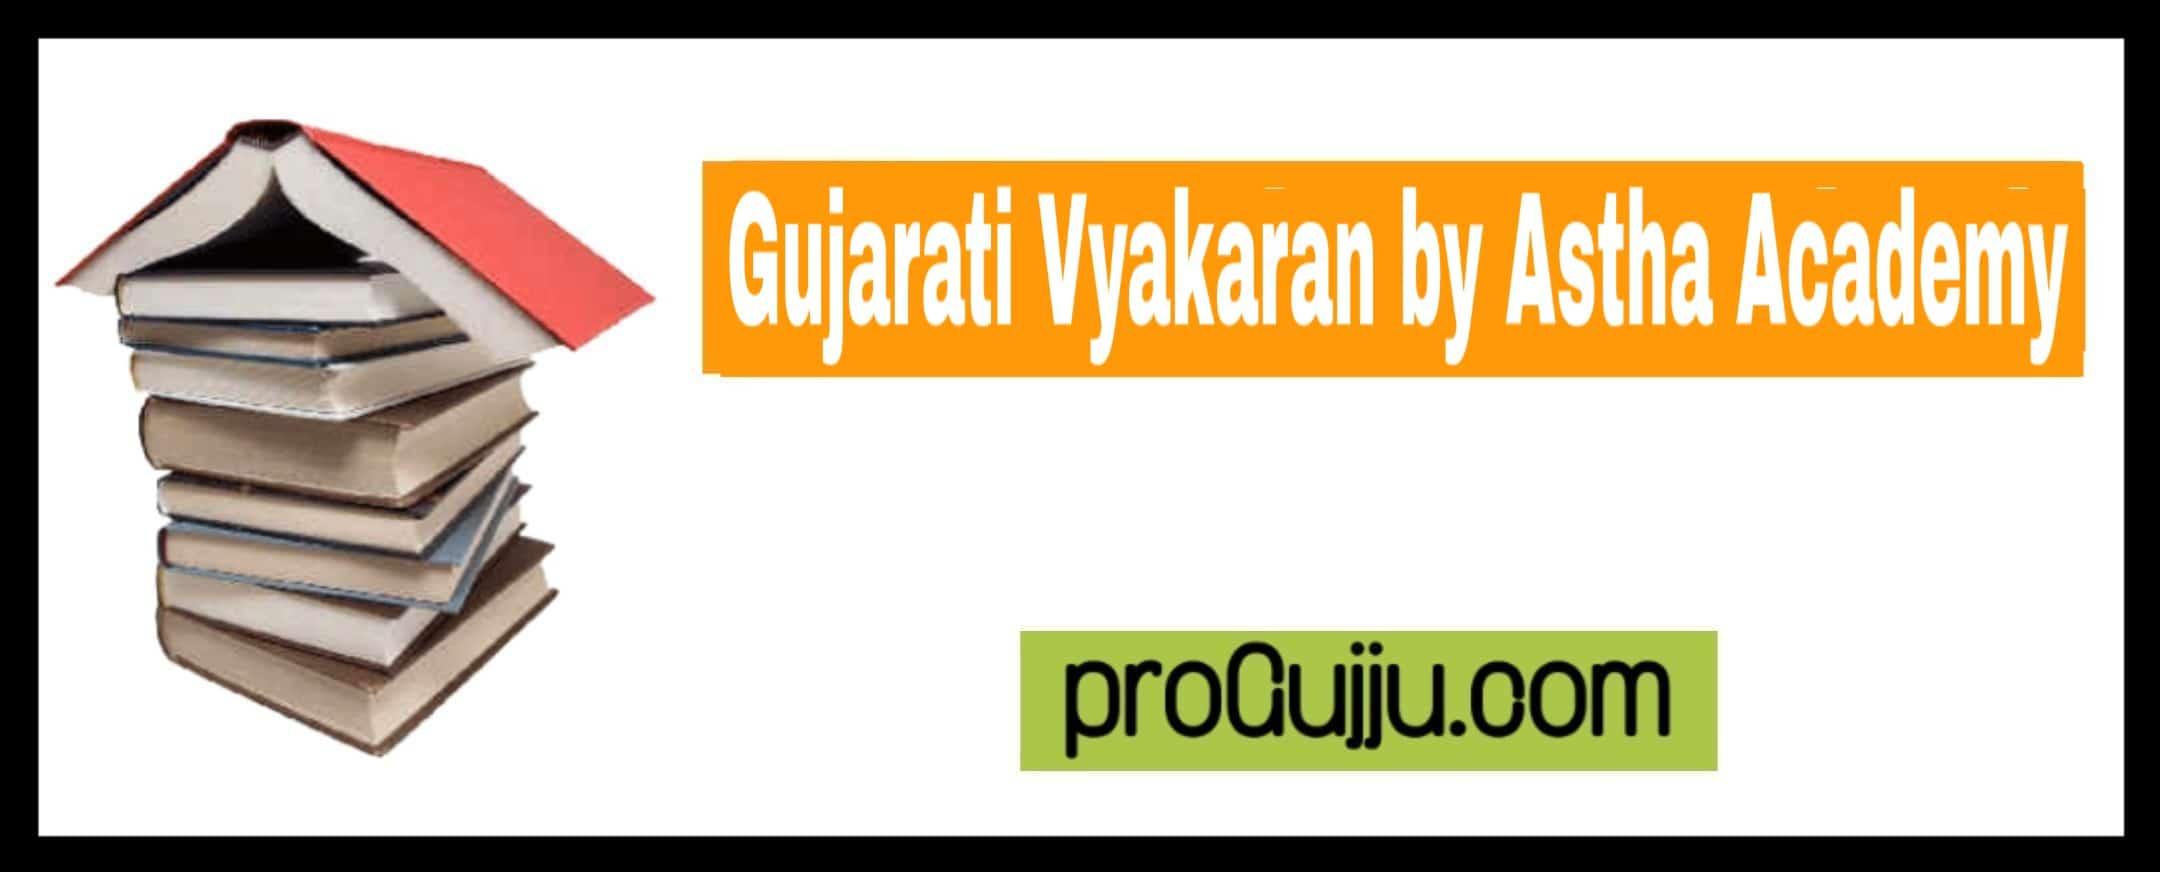 Gujarati Vyakaran book